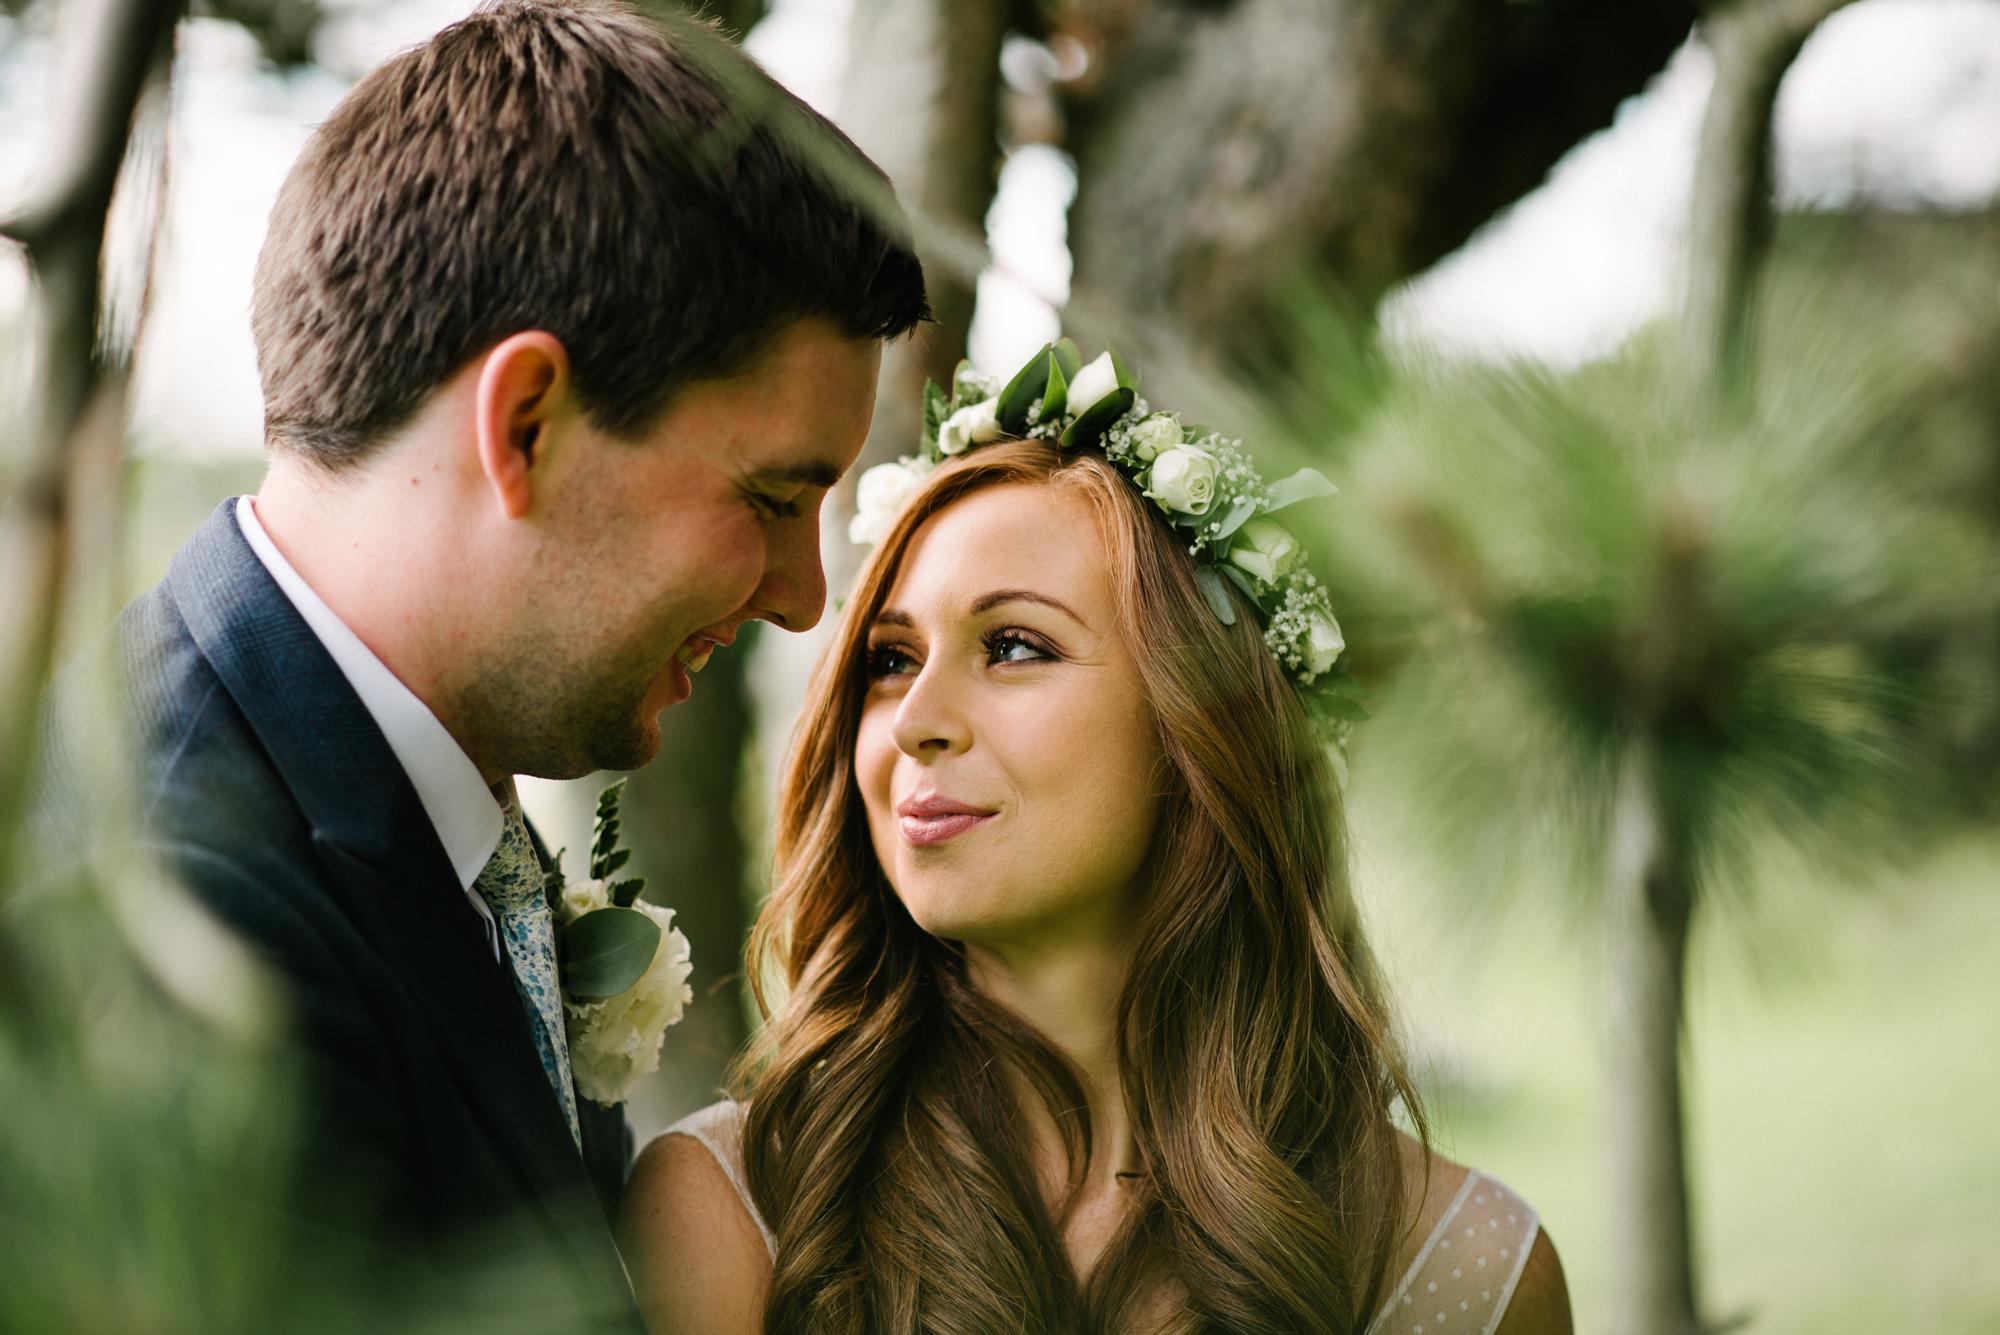 Orange_tree_house_Wedding_you_them_us_inspire_Weddings_32.jpg